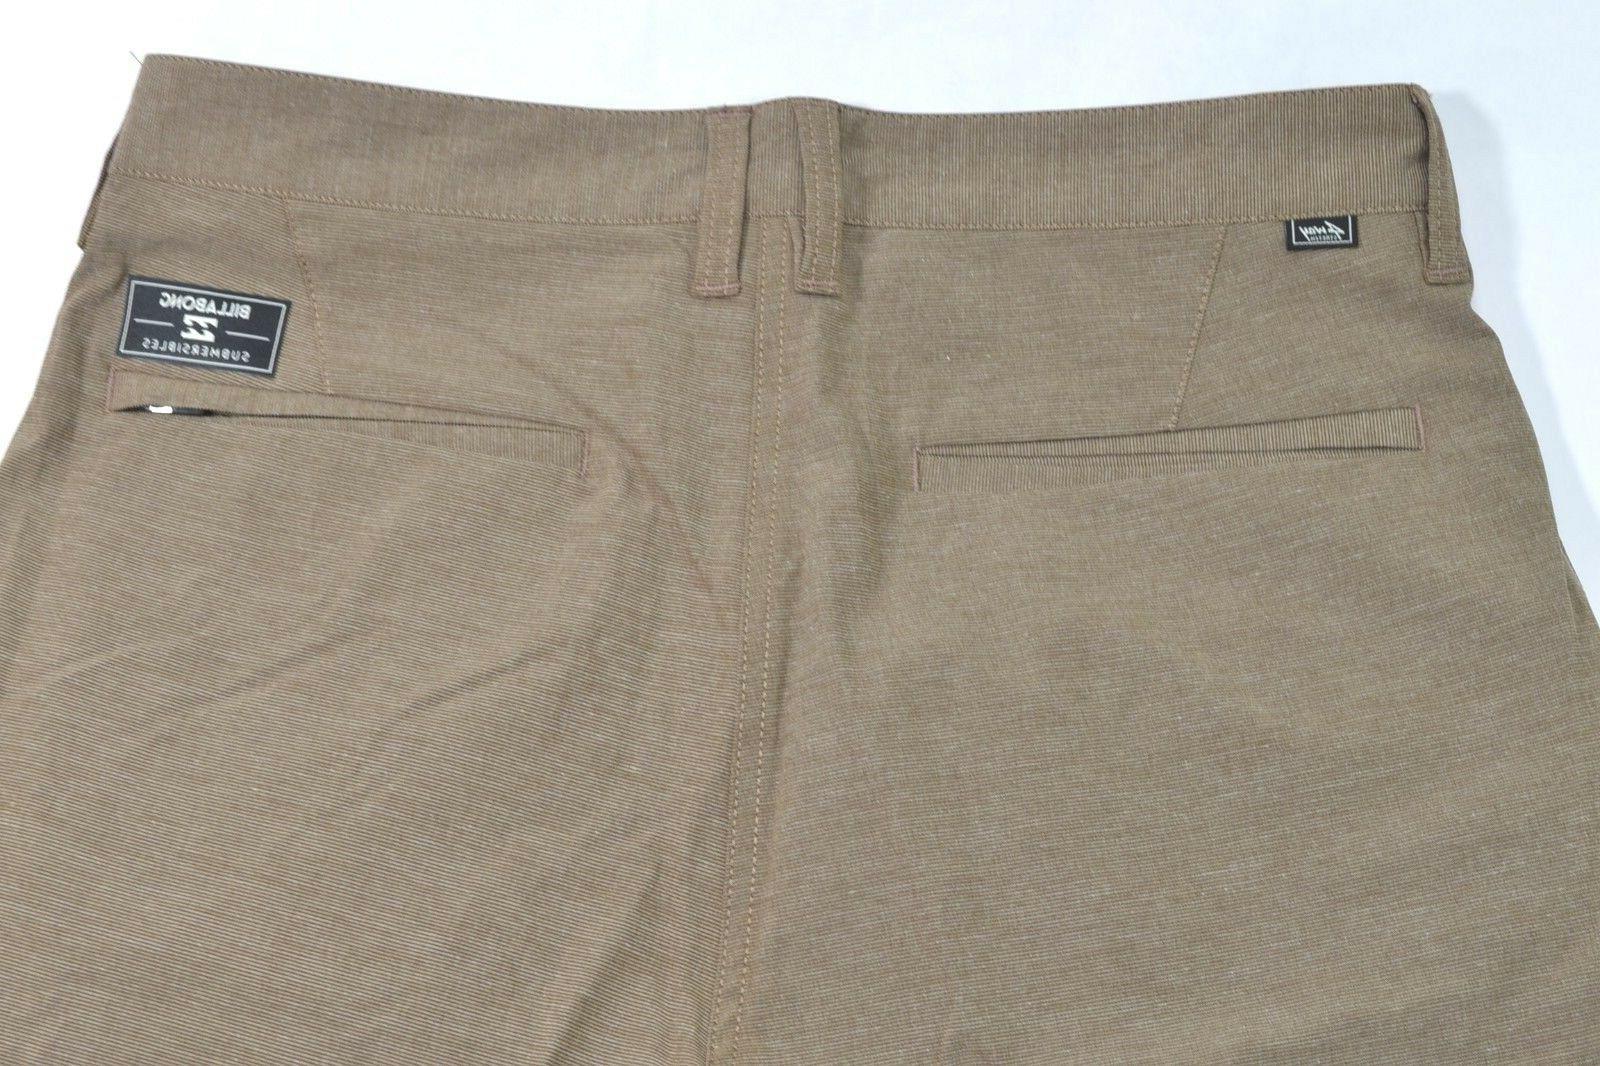 Billabong Brown Submersibles Men's Shorts